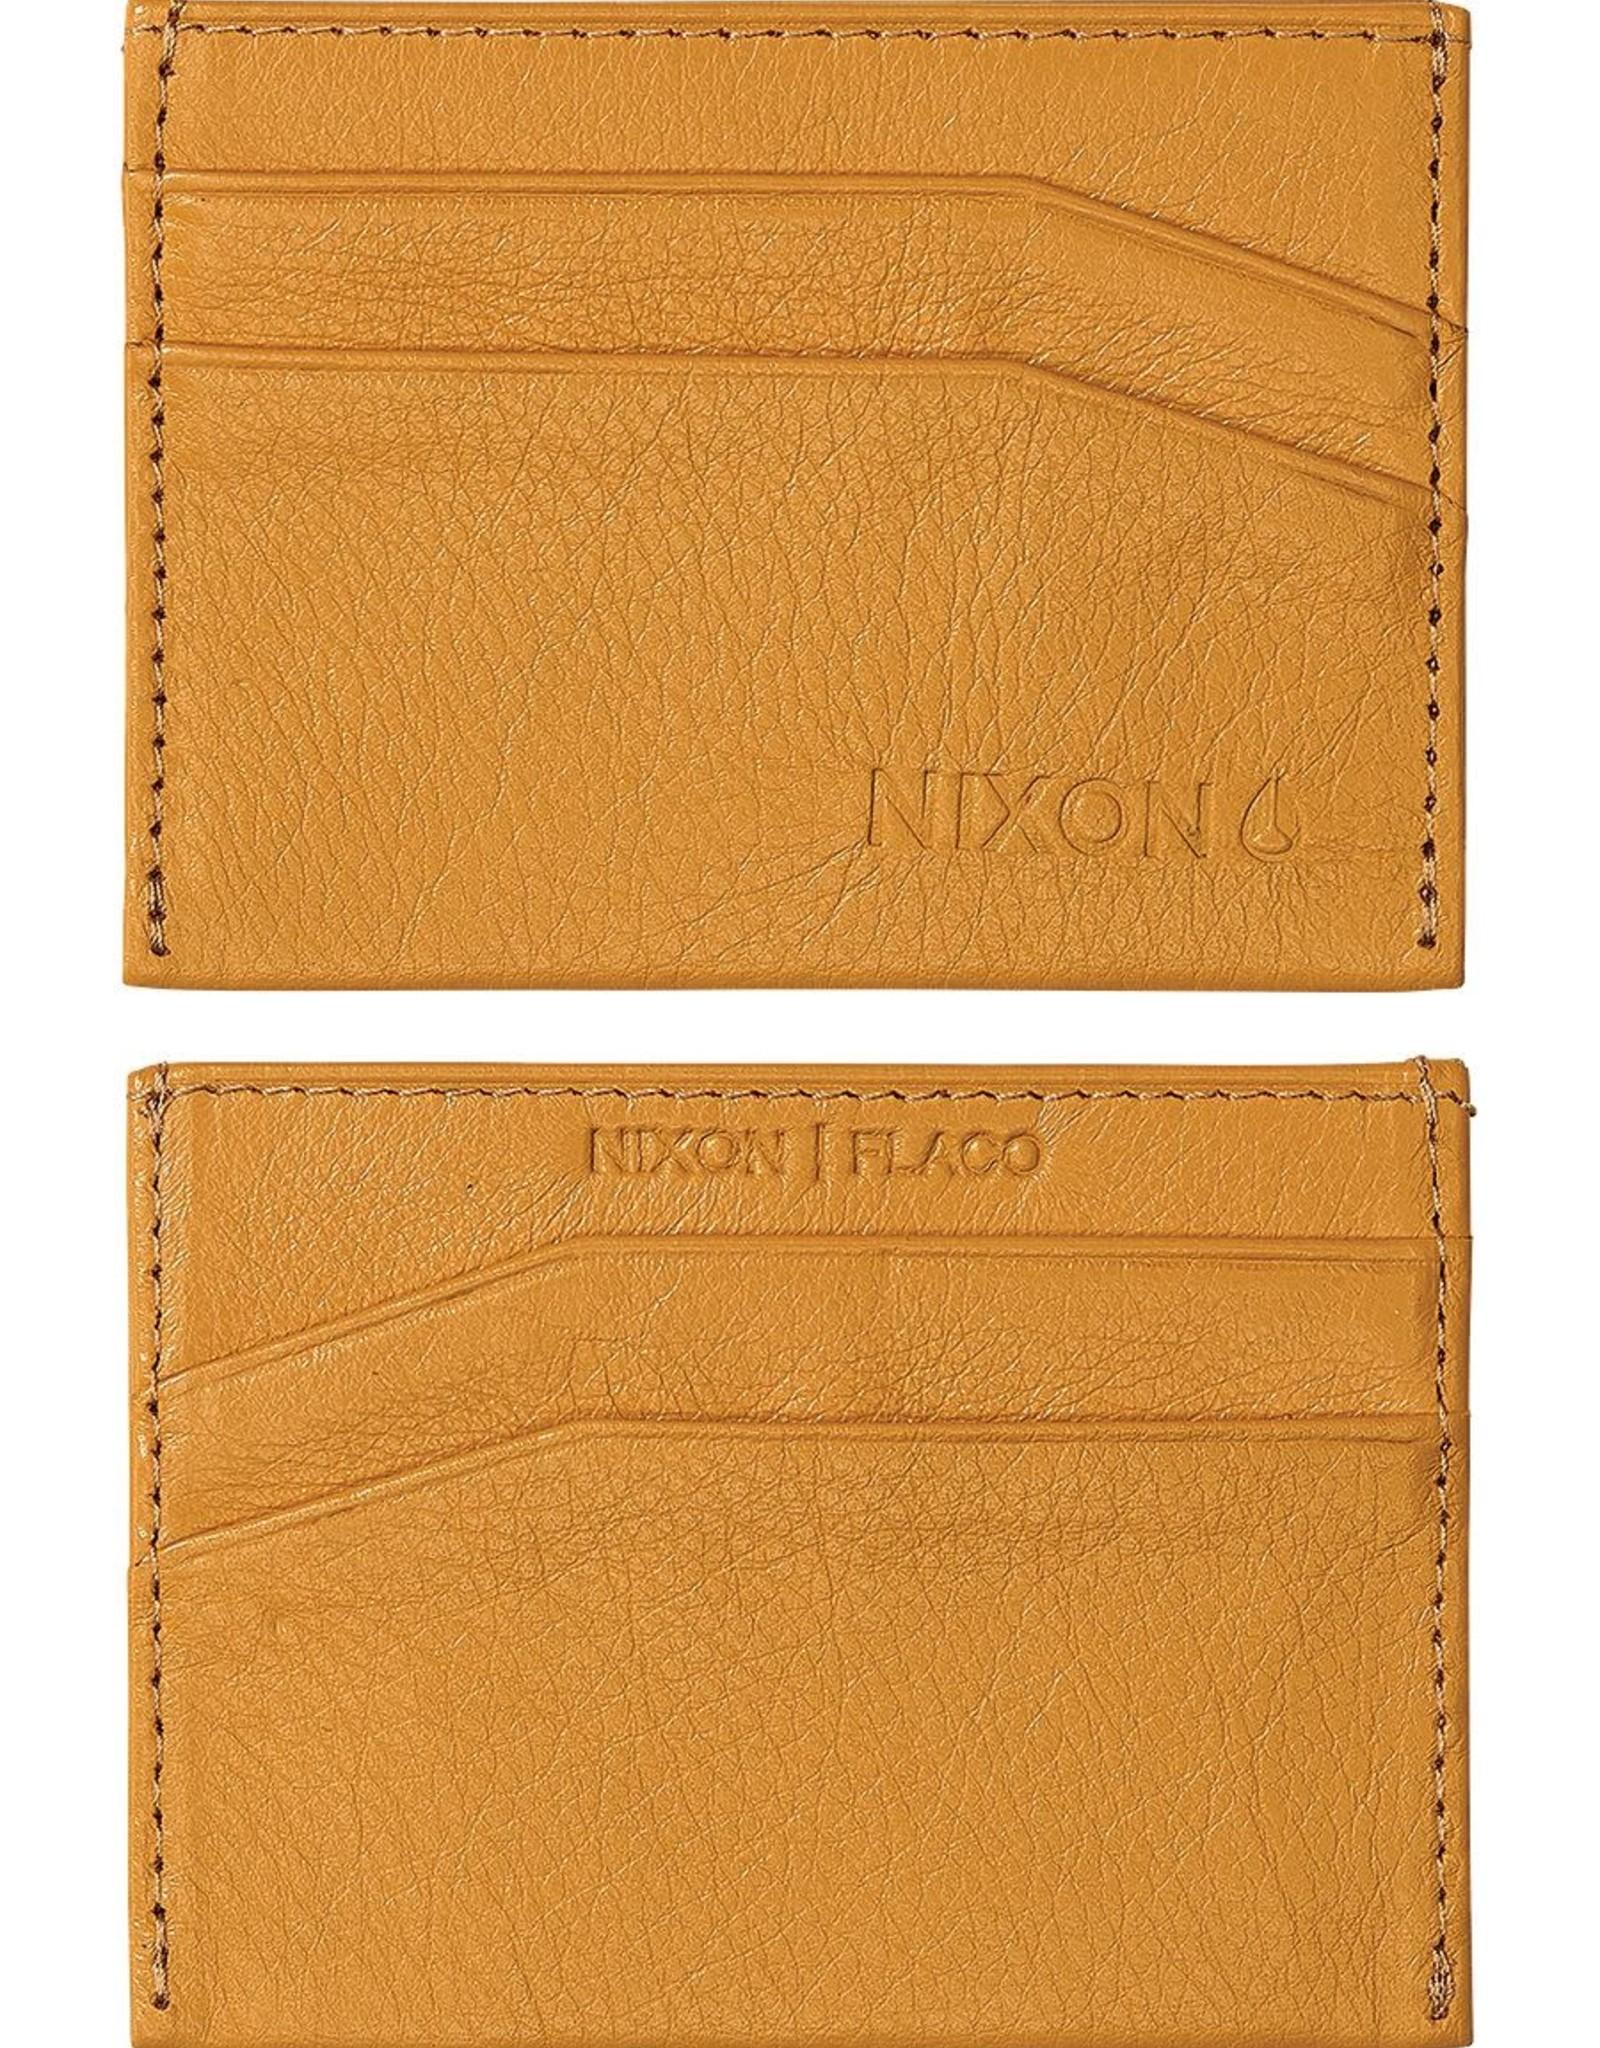 NIXON Flaco Leather Card Wallet, YELLOW